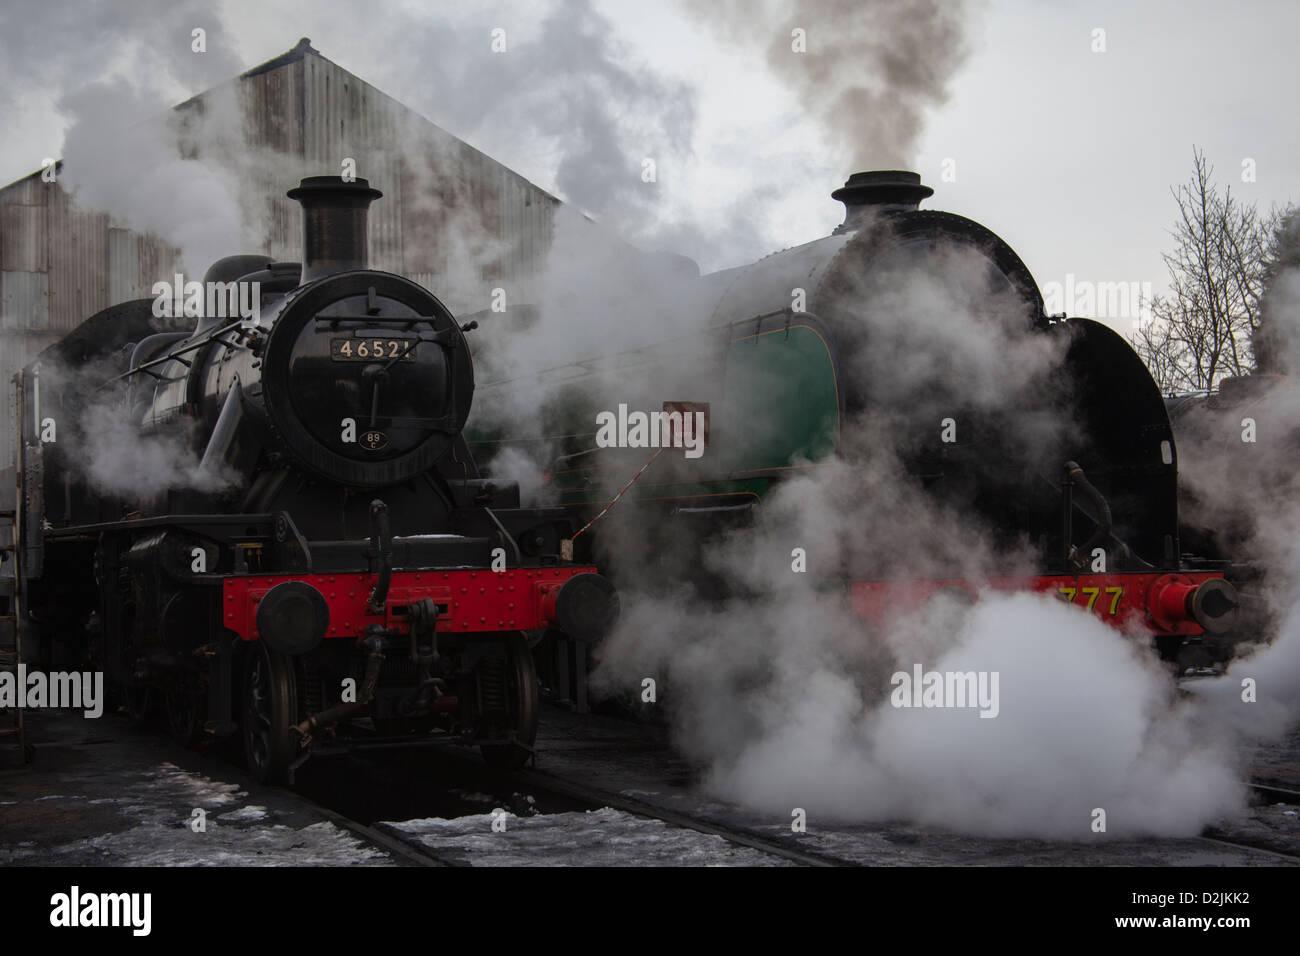 Steam locomotives Ivatt class number46521 and King Arthur class Sir Lamiel number 30777 - Stock Image